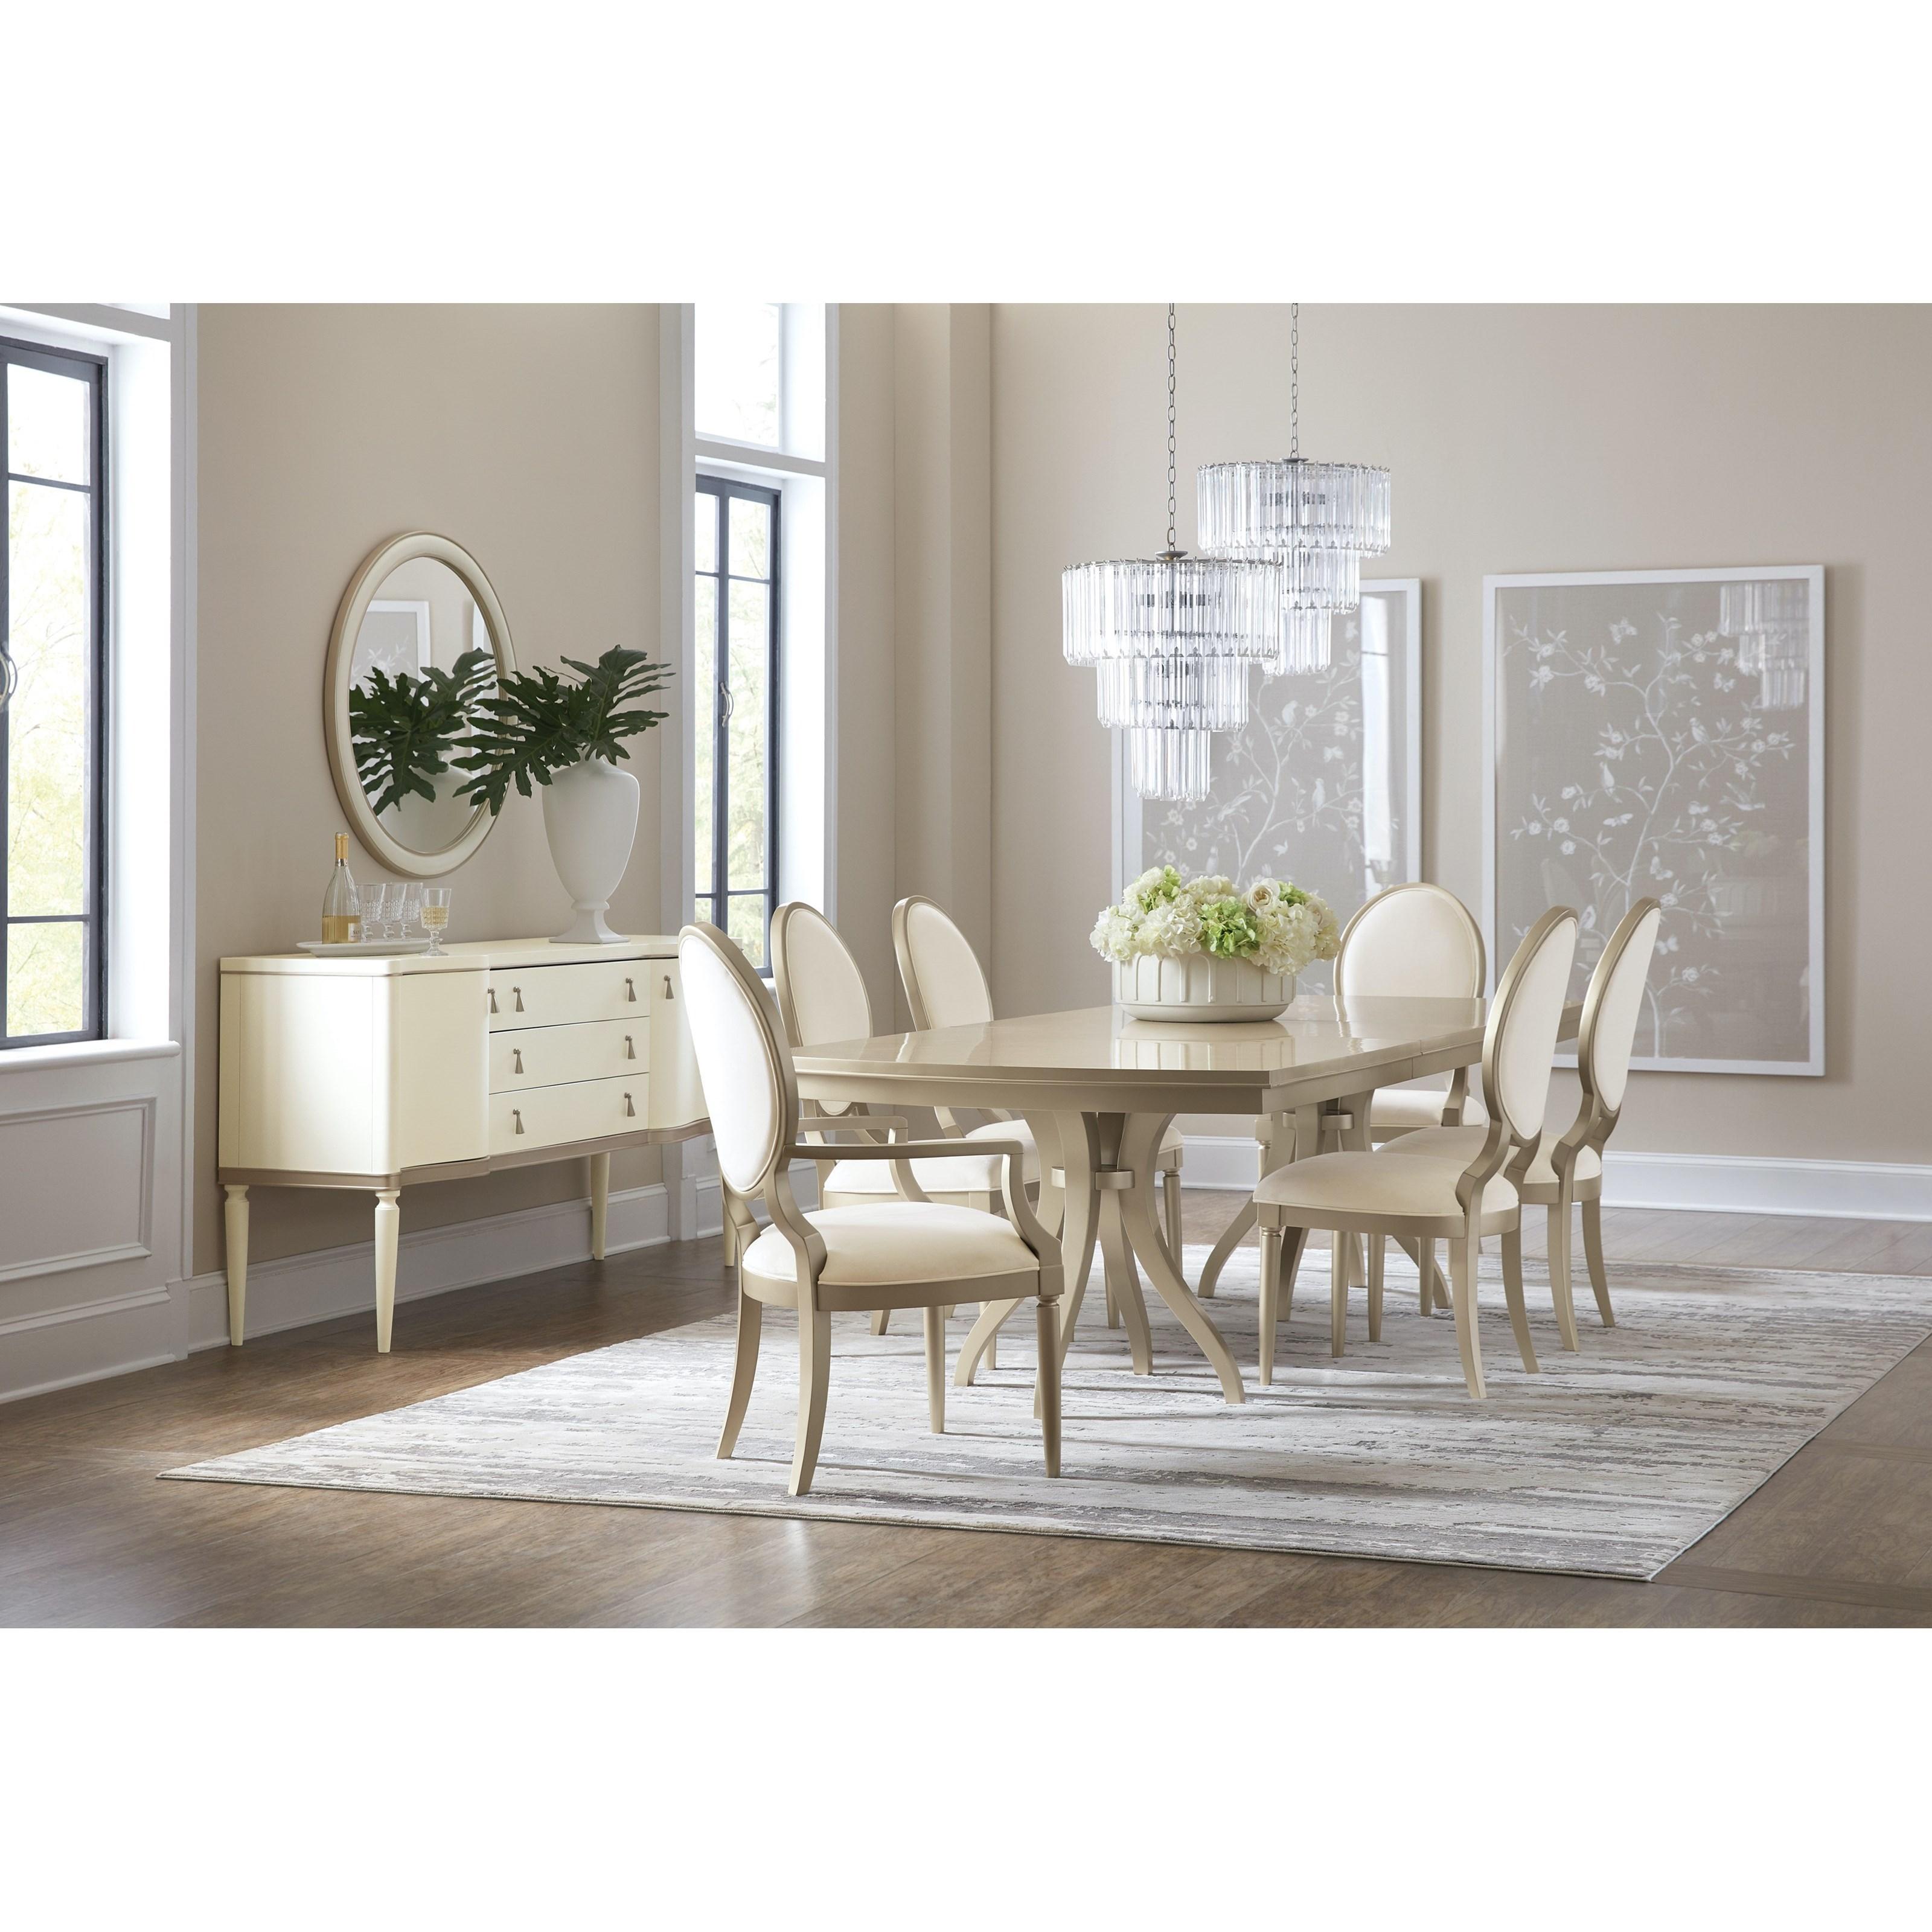 Monique Formal Dining Room Group by Hooker Furniture at Baer's Furniture